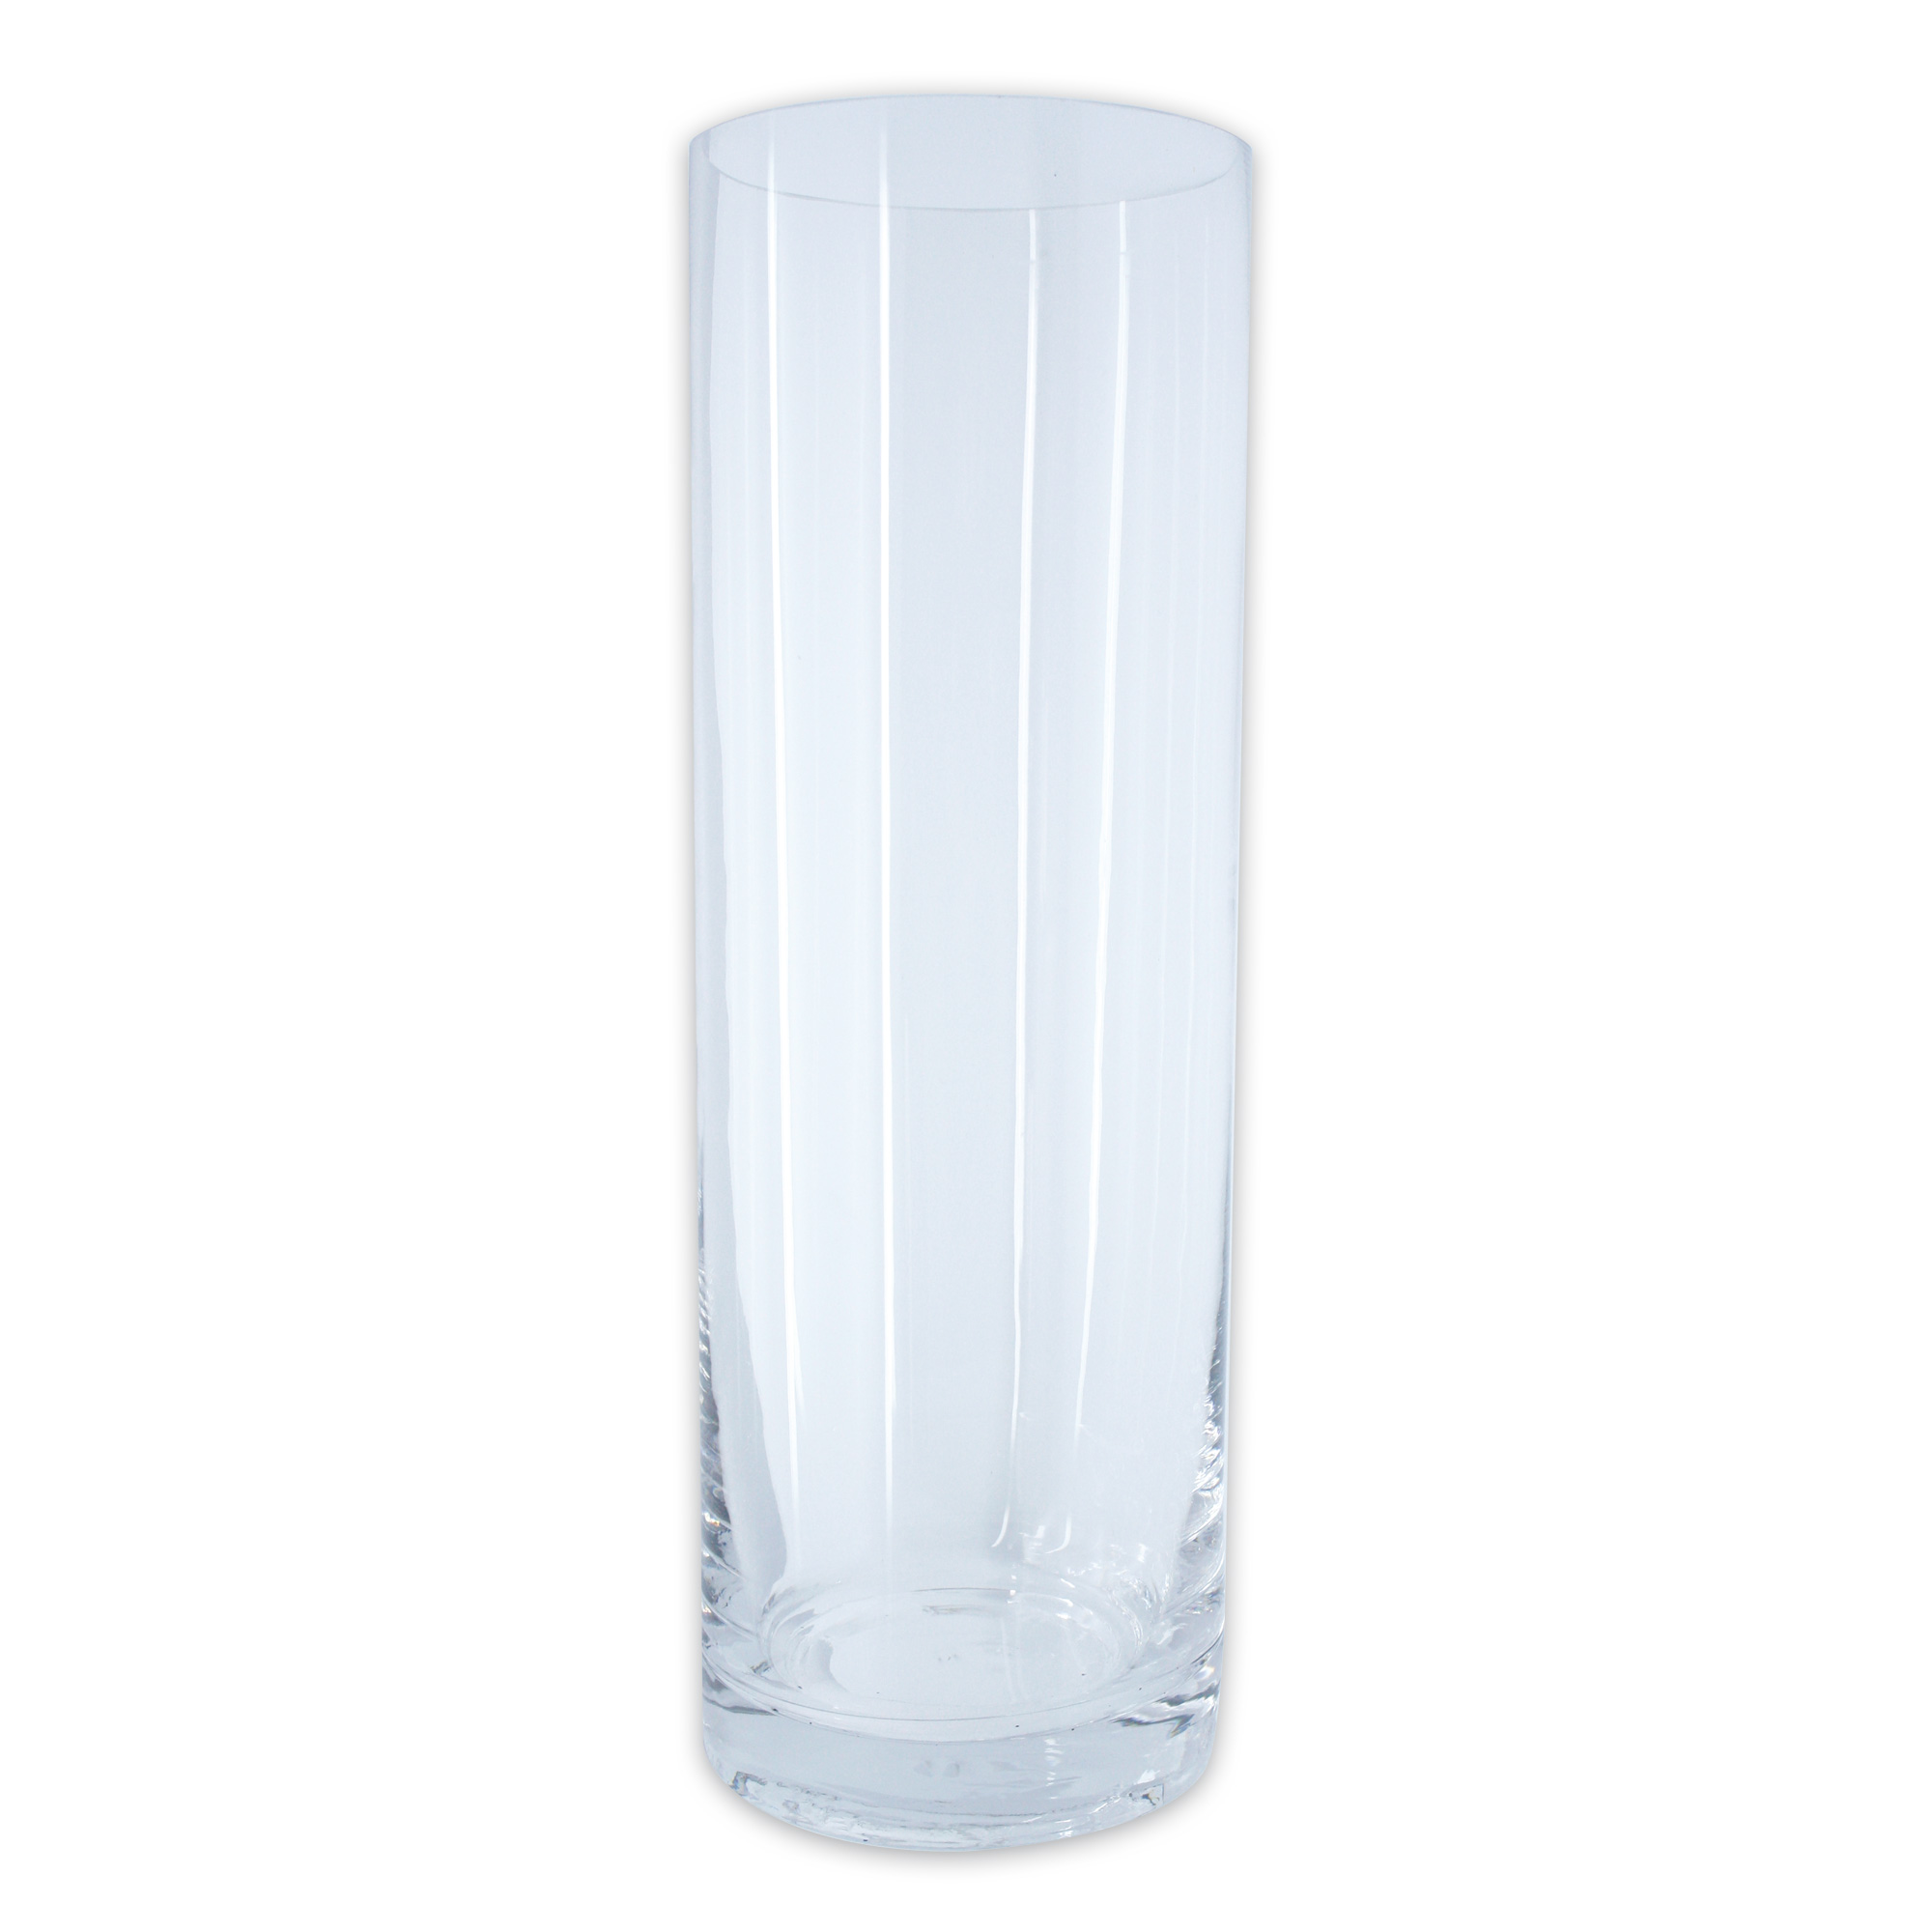 glasvase glas vase blumenvase dekovase windlicht glaszylinder h he 30 cm 10 cm ebay. Black Bedroom Furniture Sets. Home Design Ideas